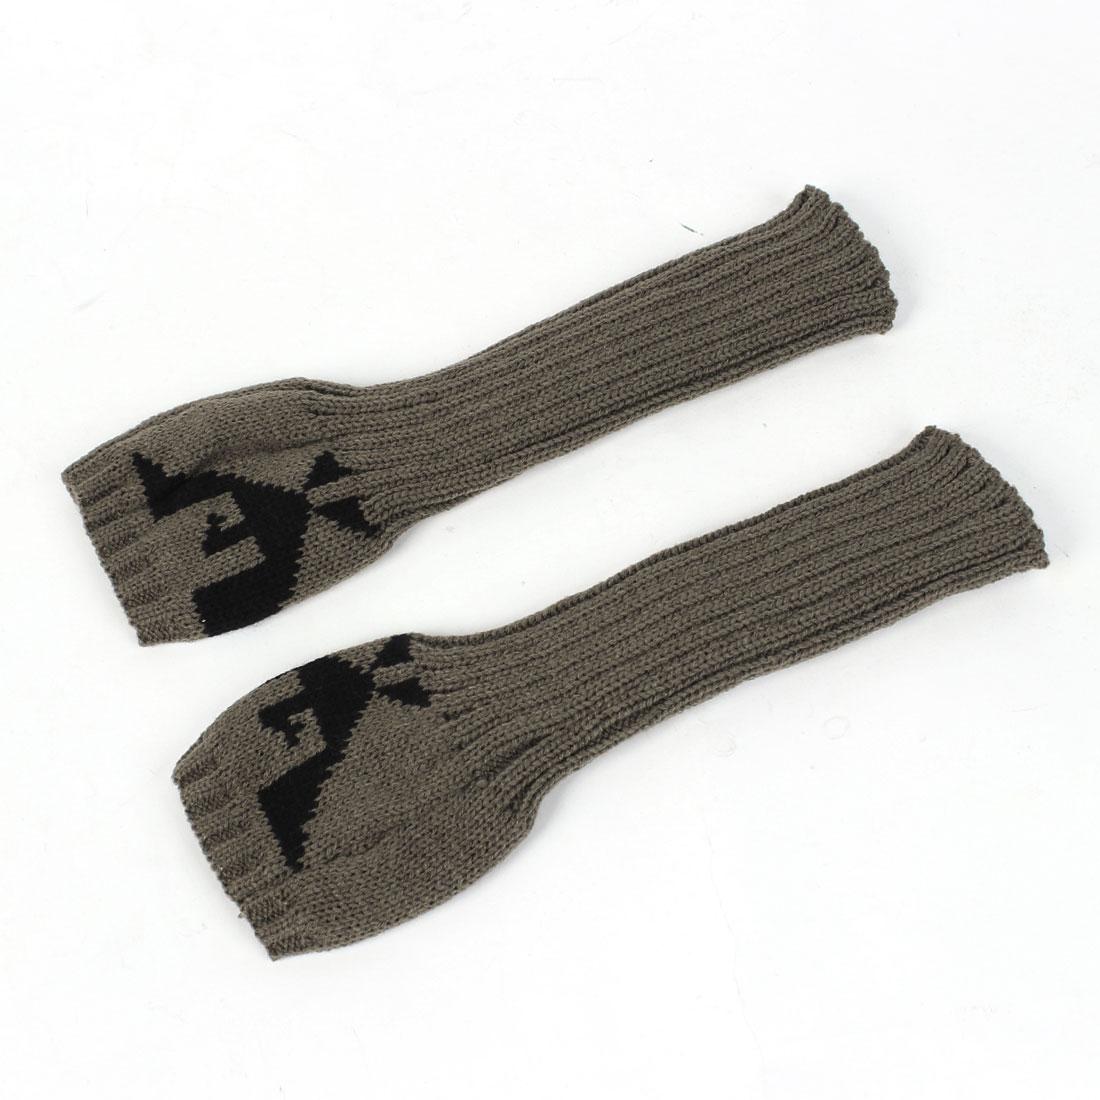 Ladies Eagle Pattern Elbow Length Knitted Long Fingerless Gloves Dark Khaki Pair